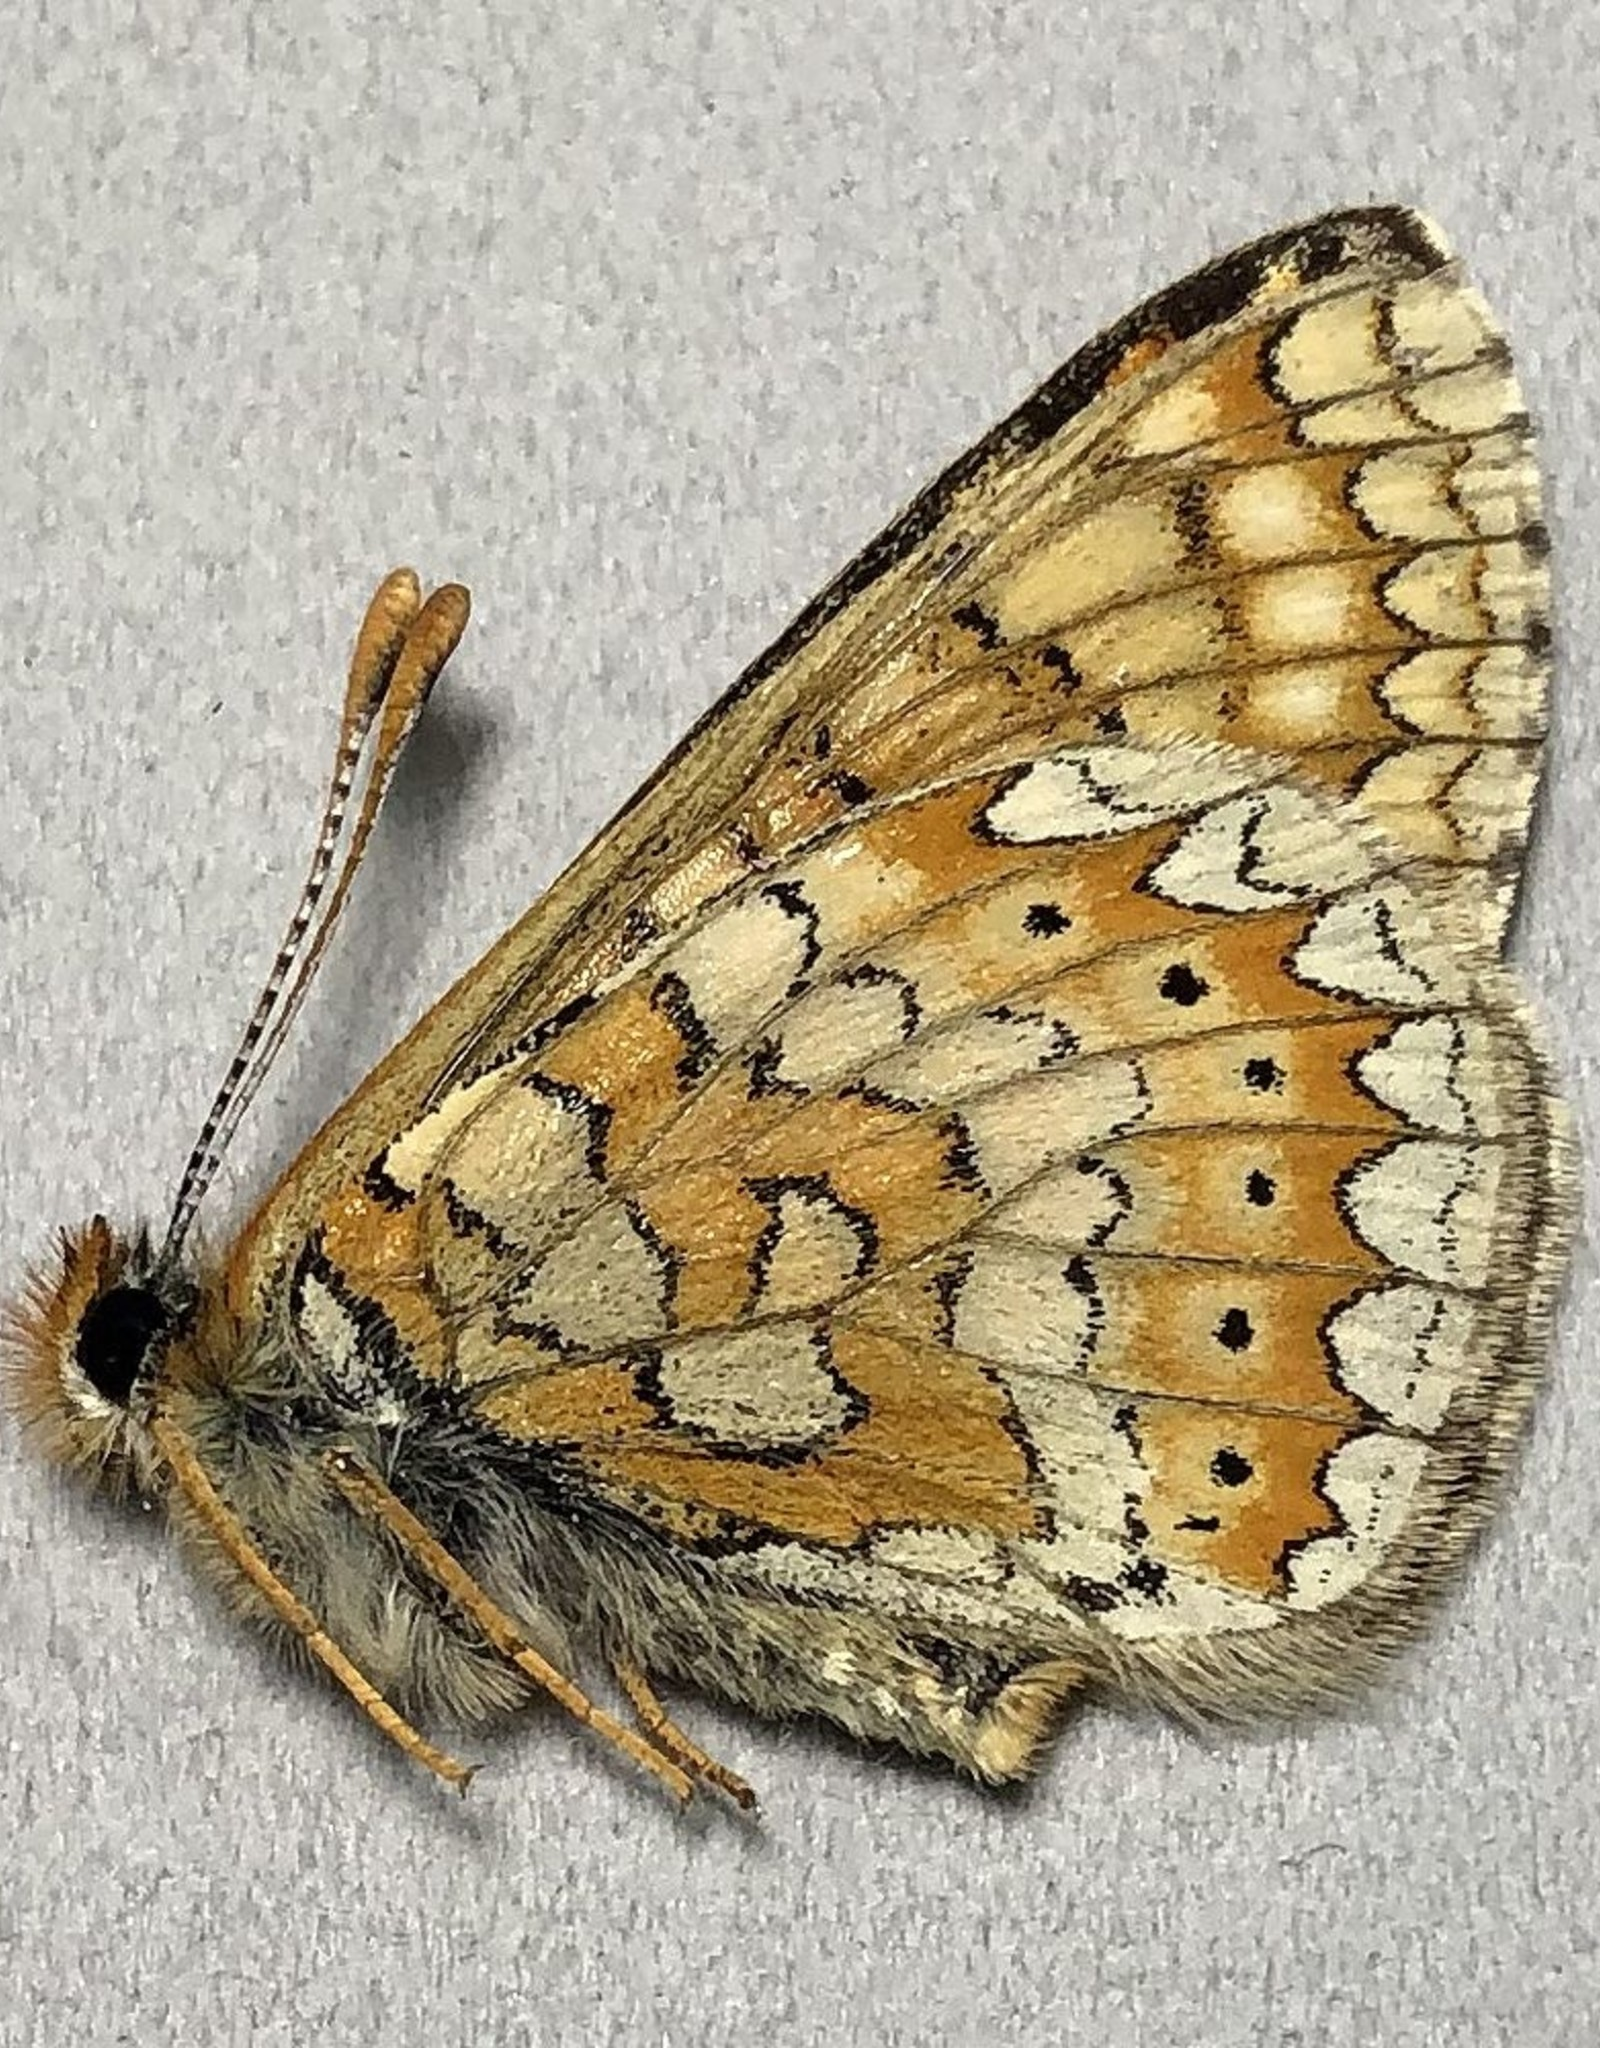 Euphydryas aurinia P A1 Armenia